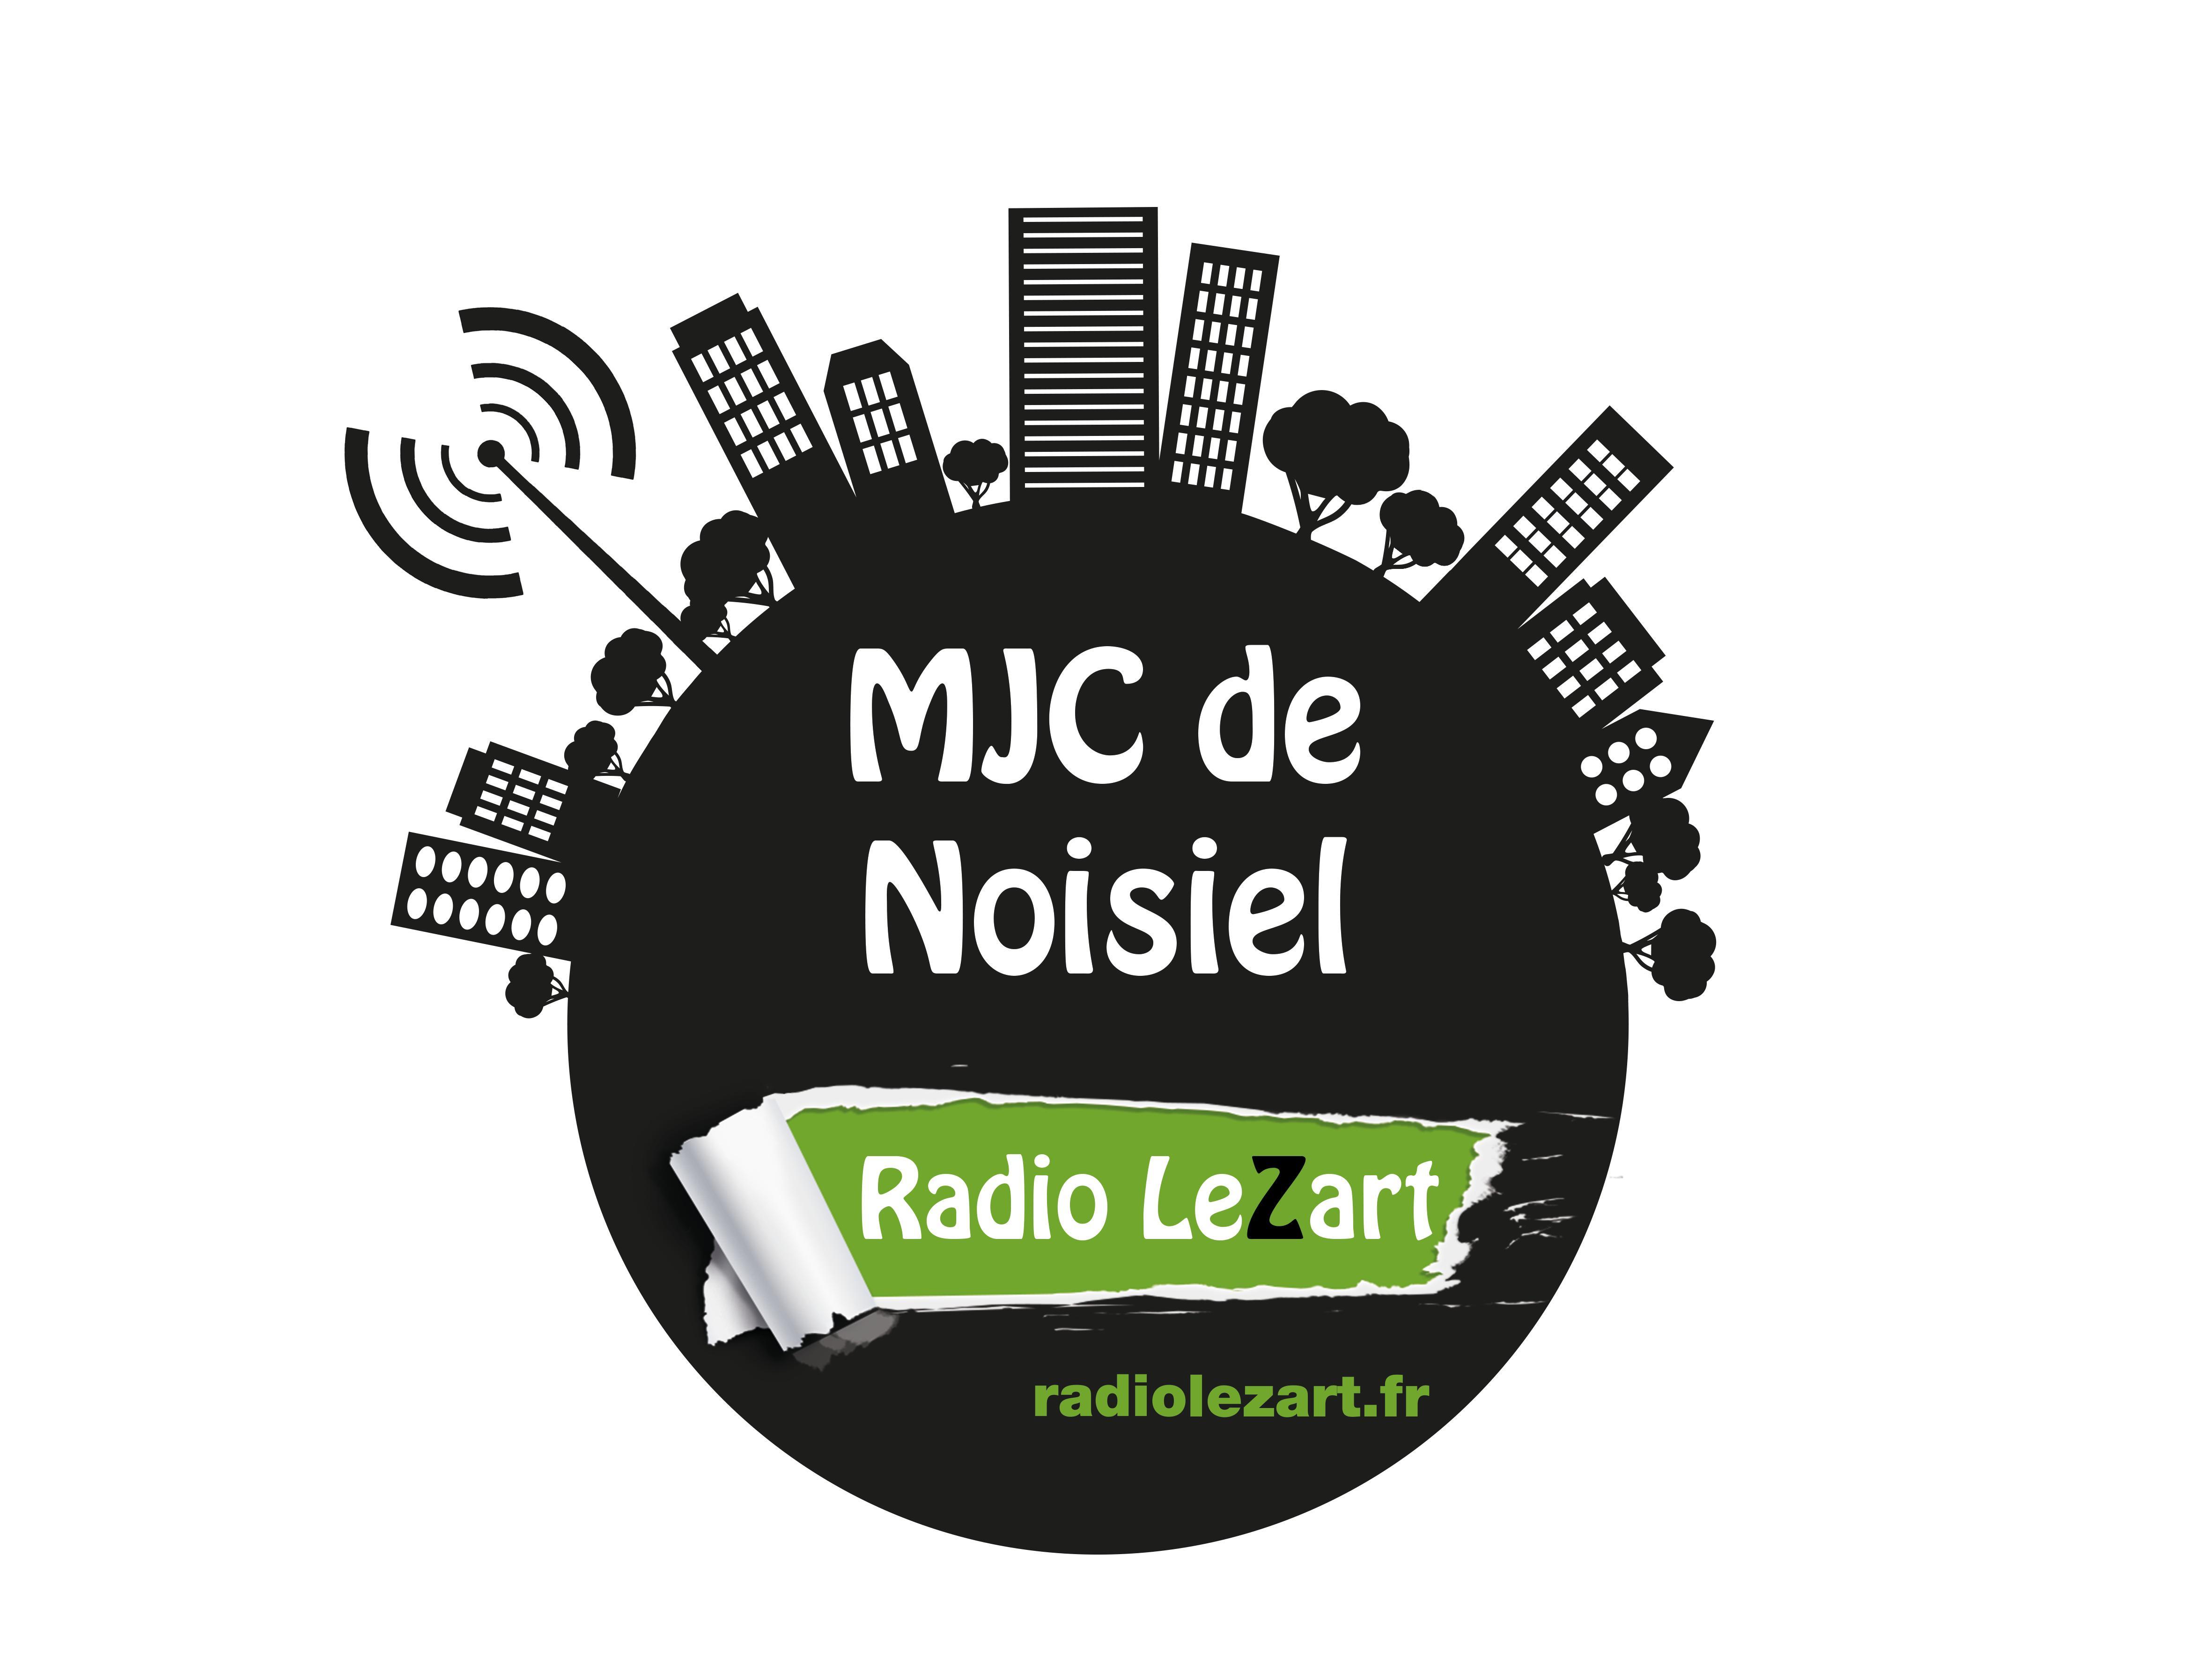 RadioLezart_noisiel